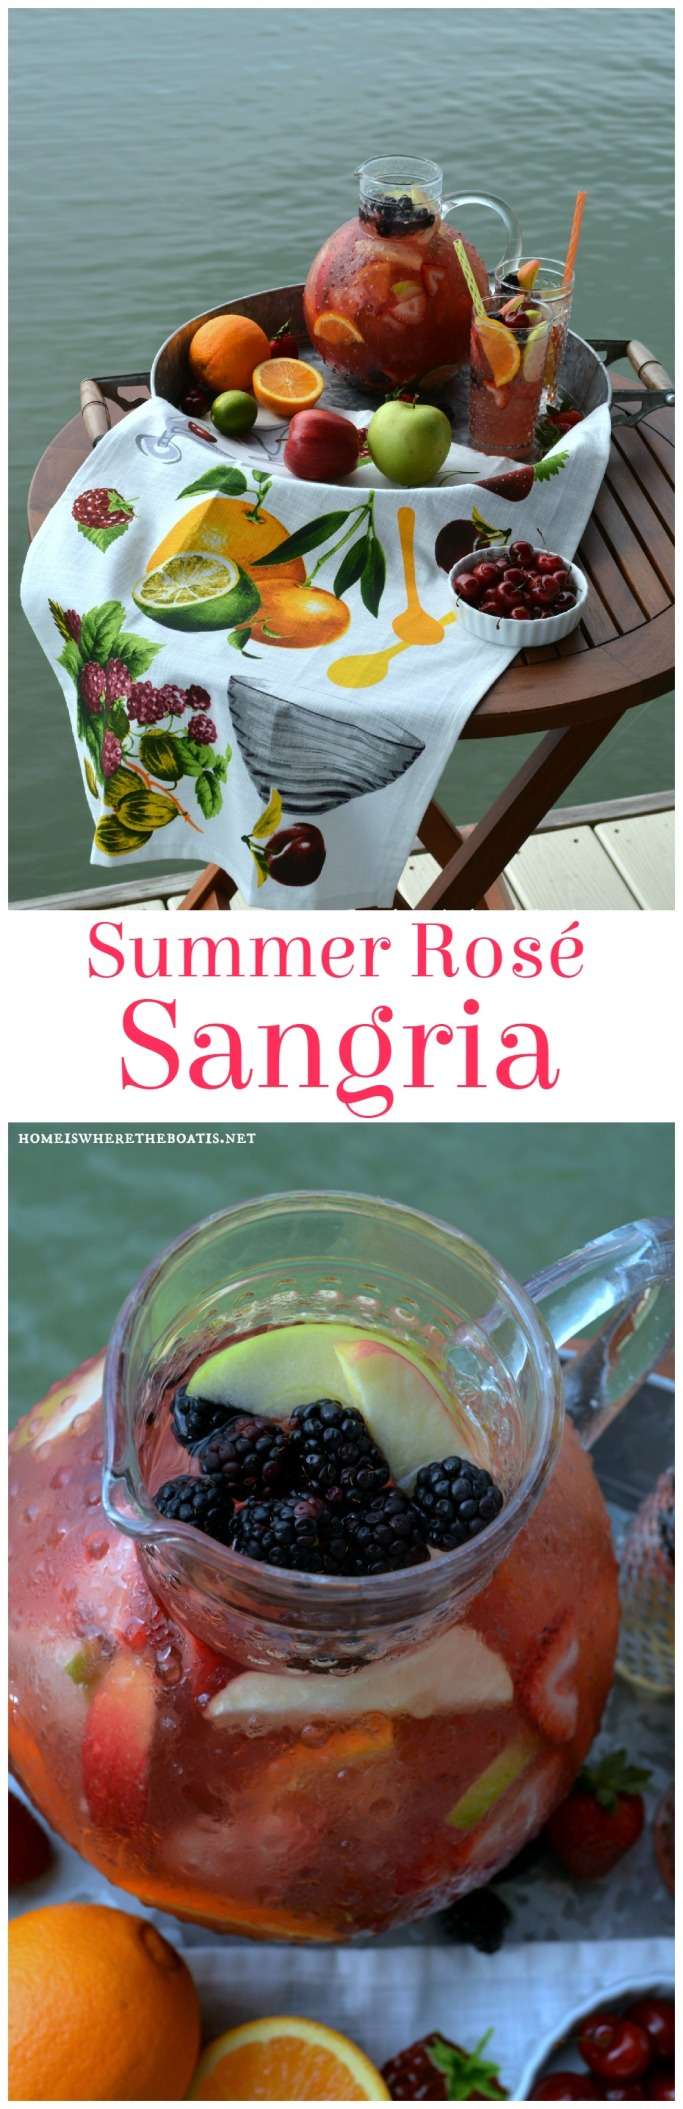 Summer Rose Sangria